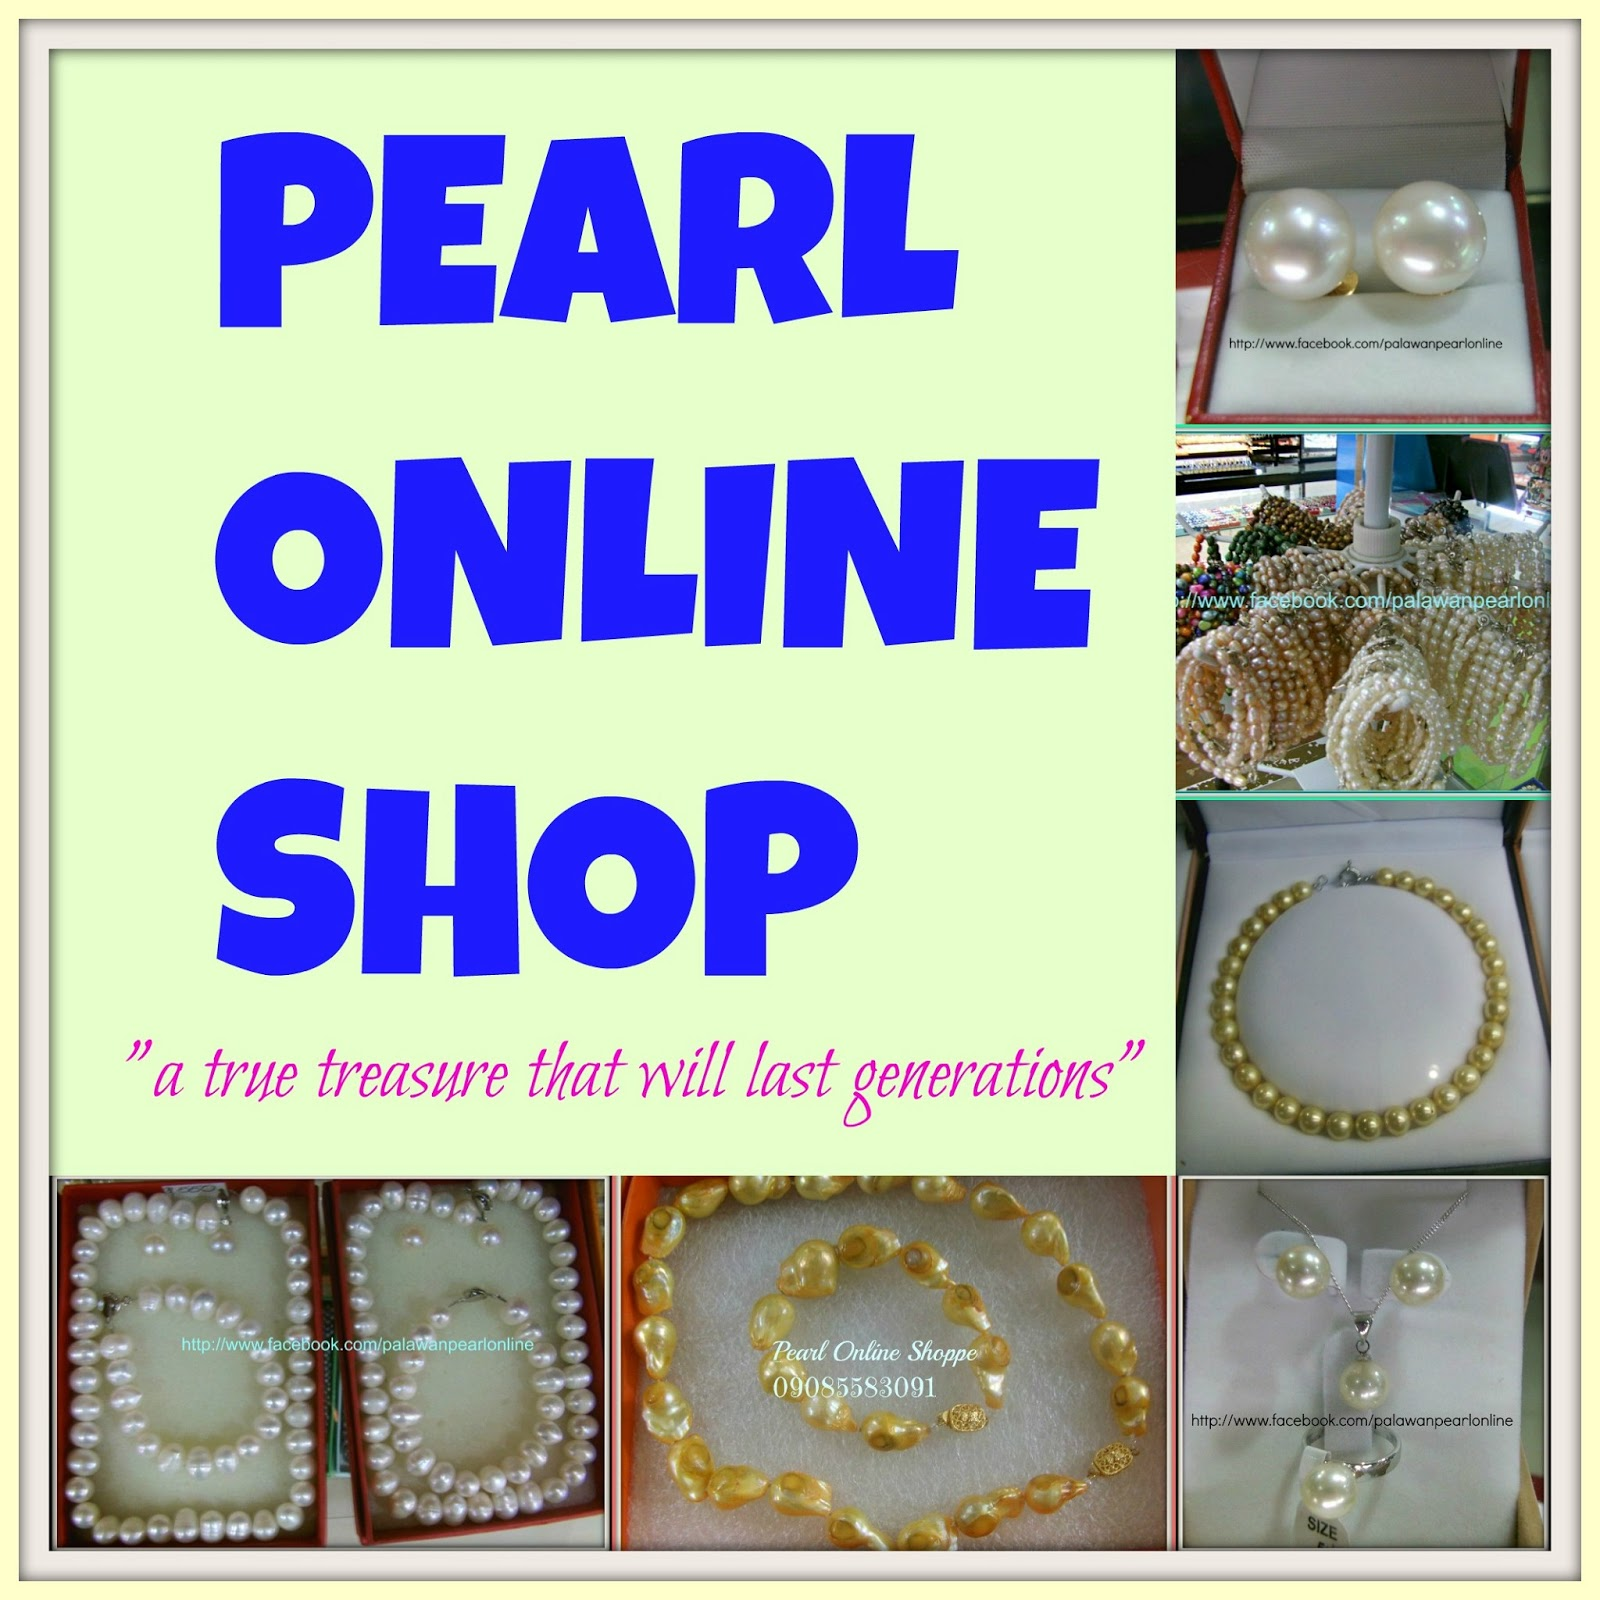 pearl online shop.de